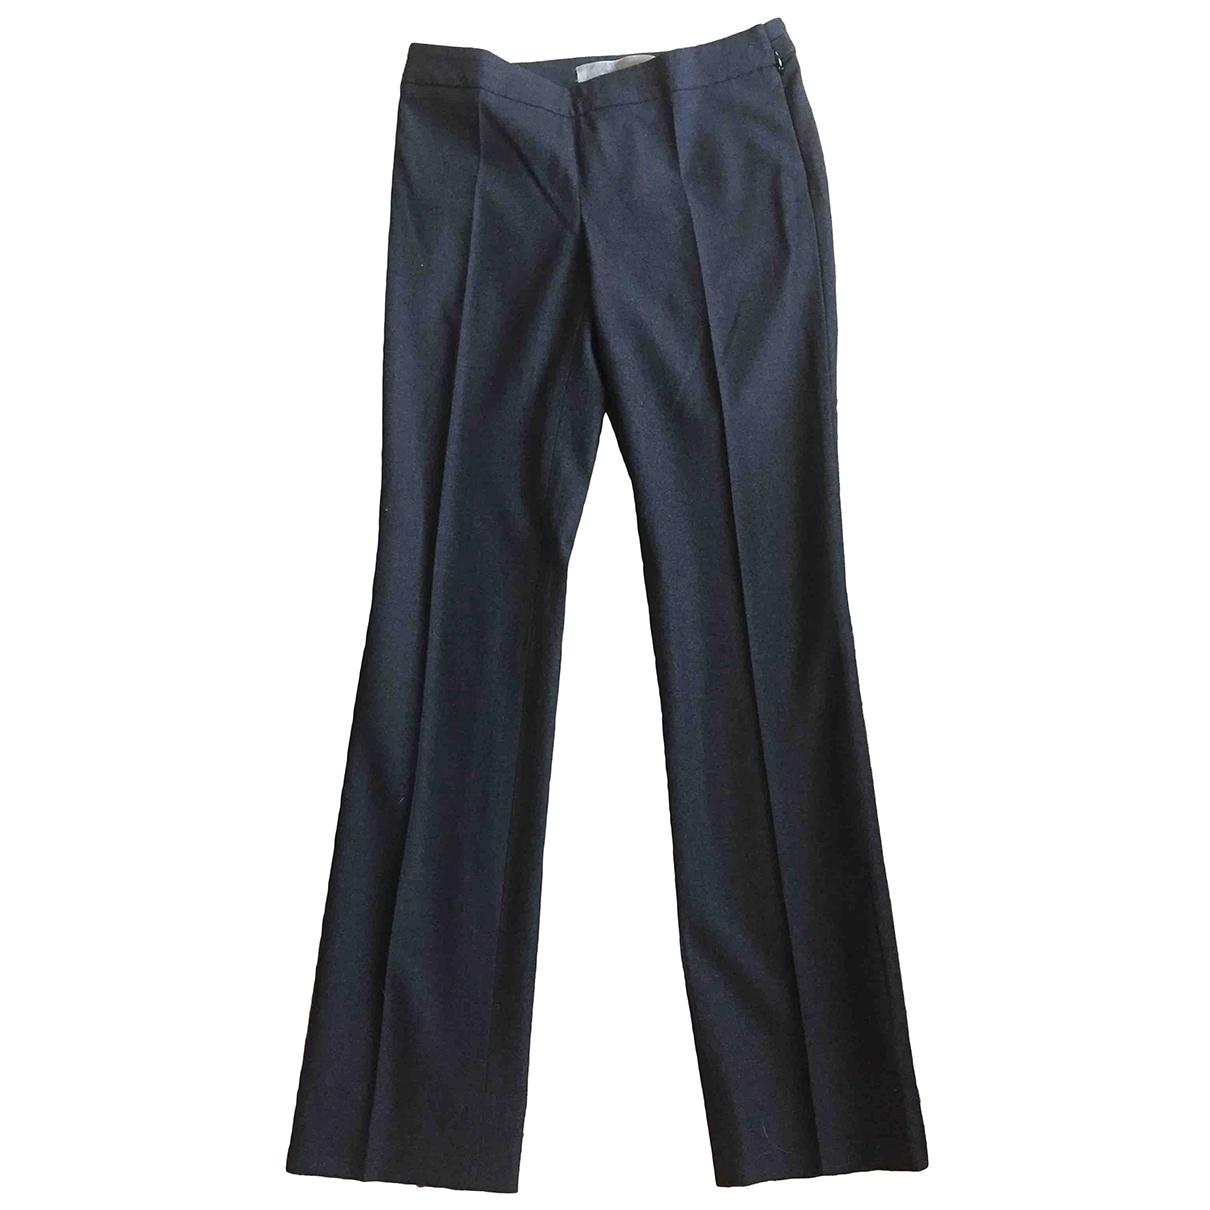 Pantalon pitillo de Lana Reed Krakoff